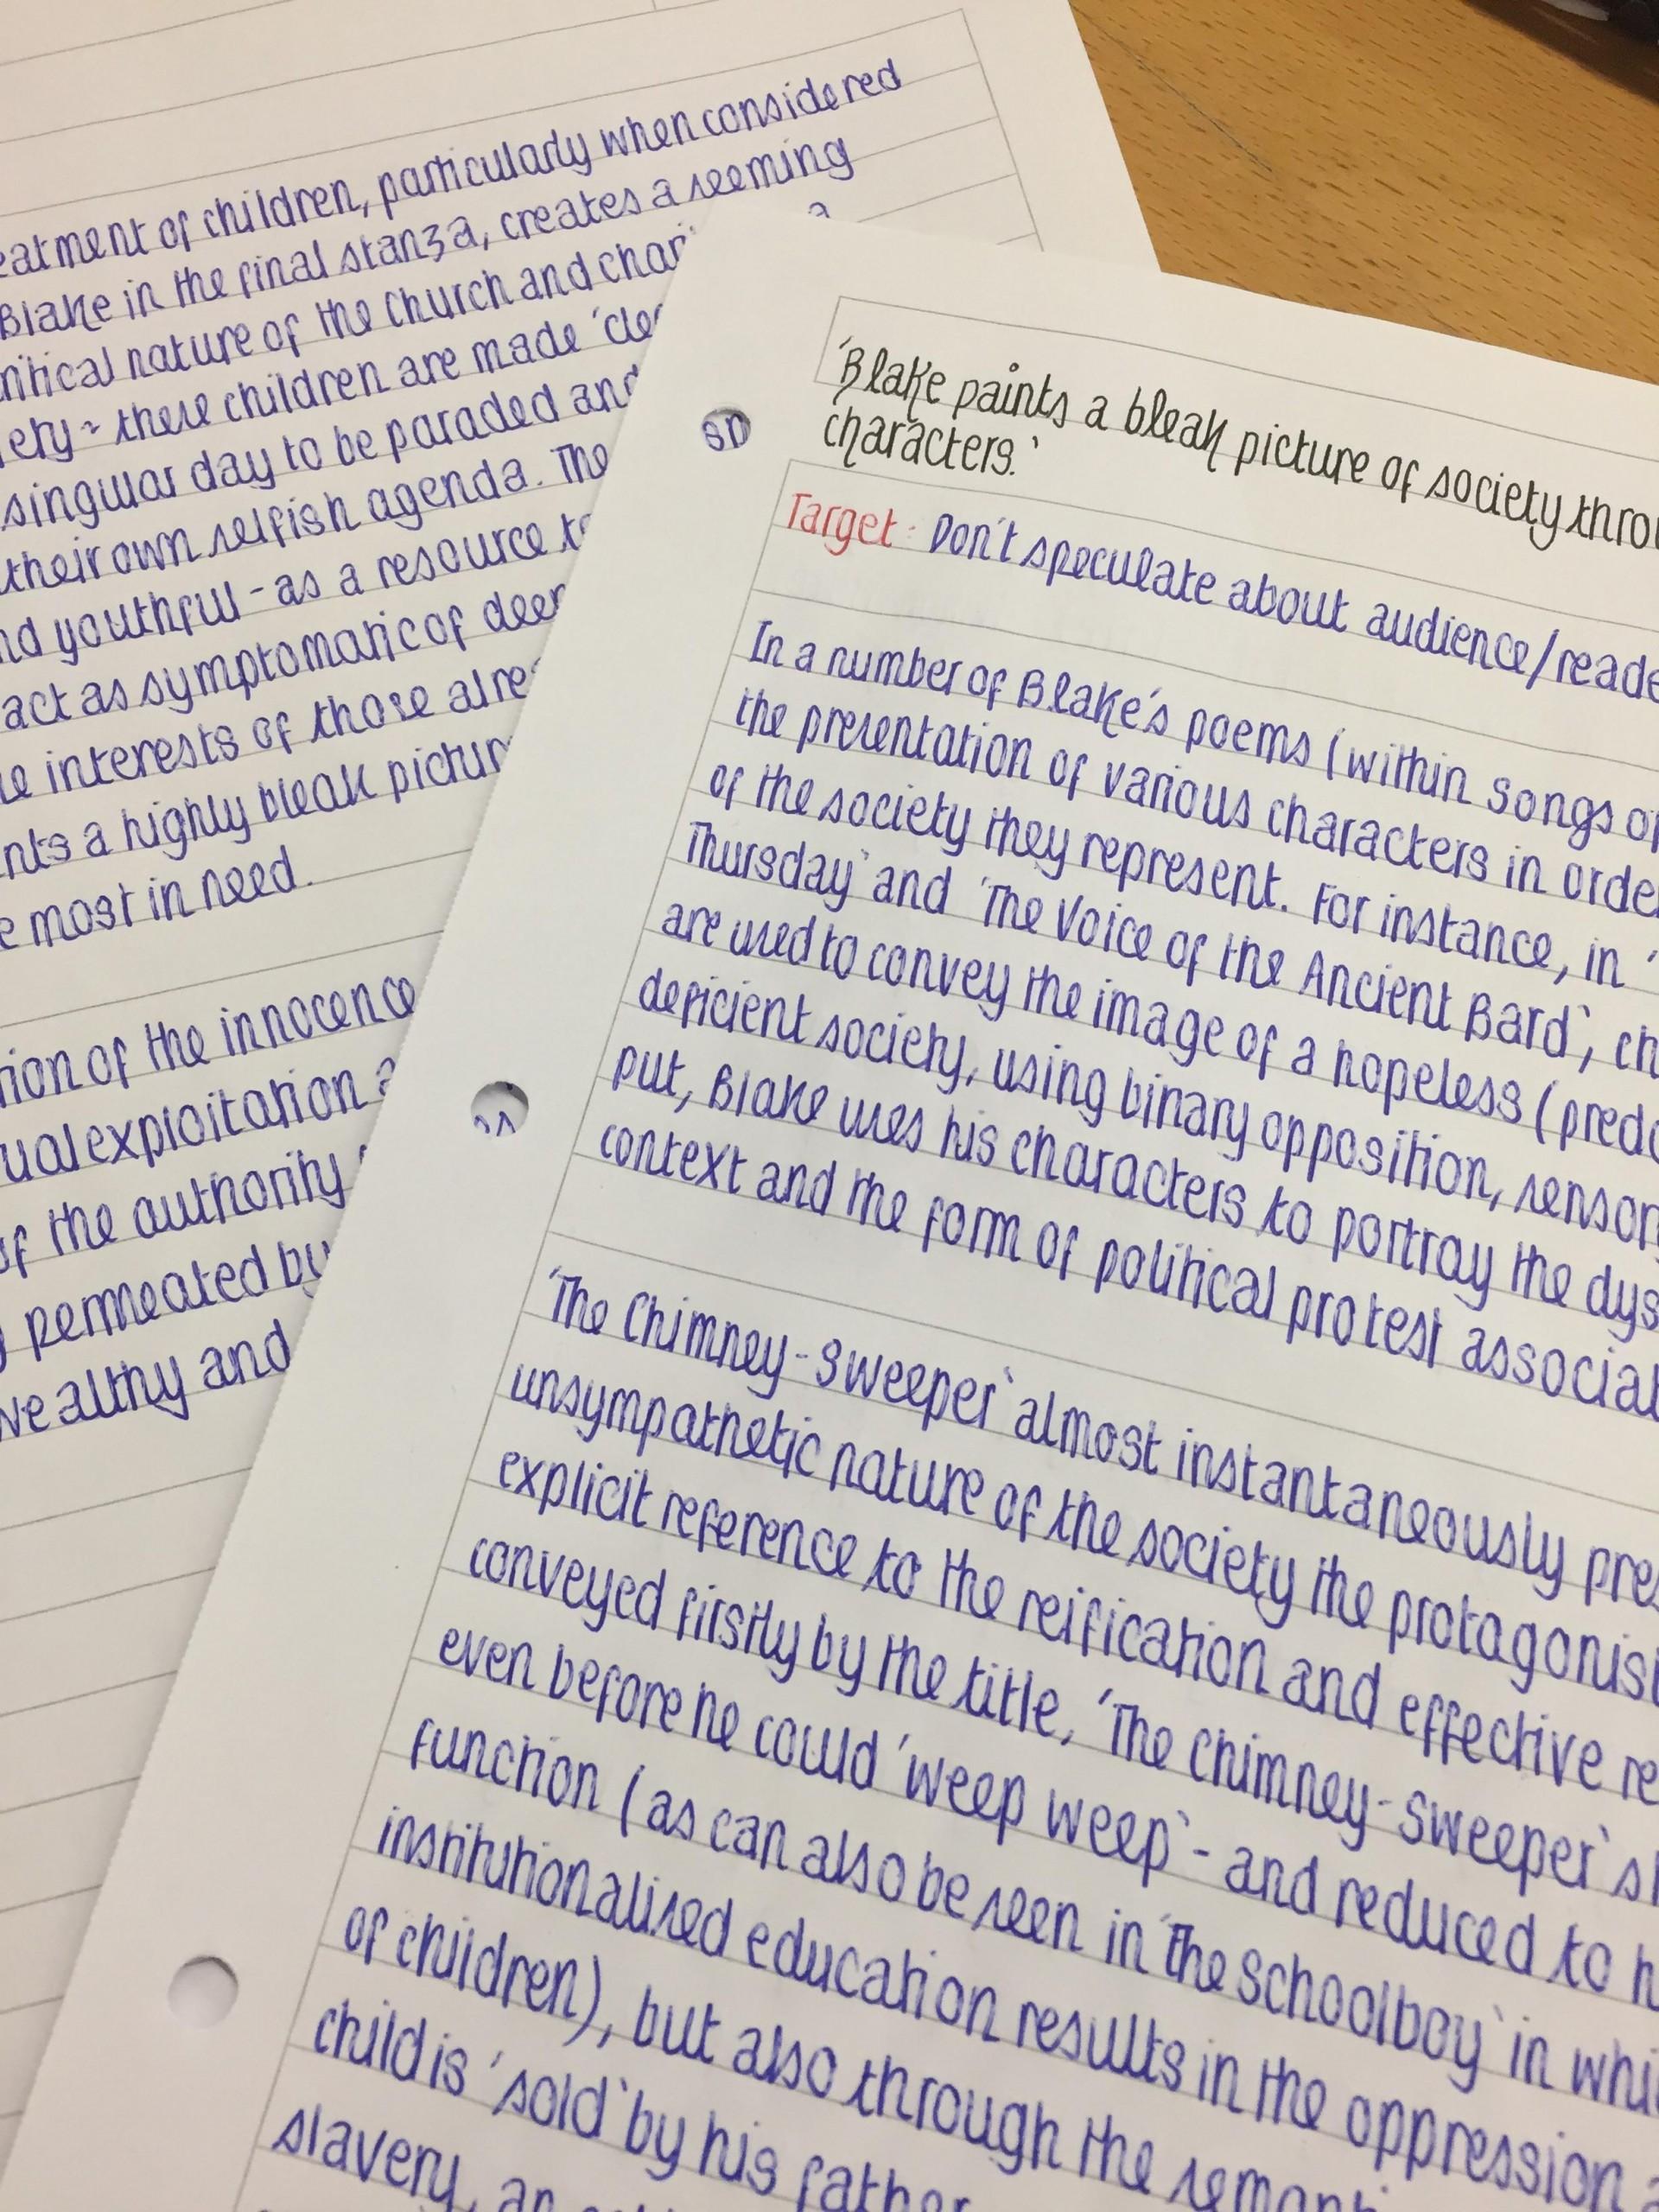 004 02scwurpga301 Essay On Handwriting Fearsome Short Importance Of Good In Hindi Gujarati 1920